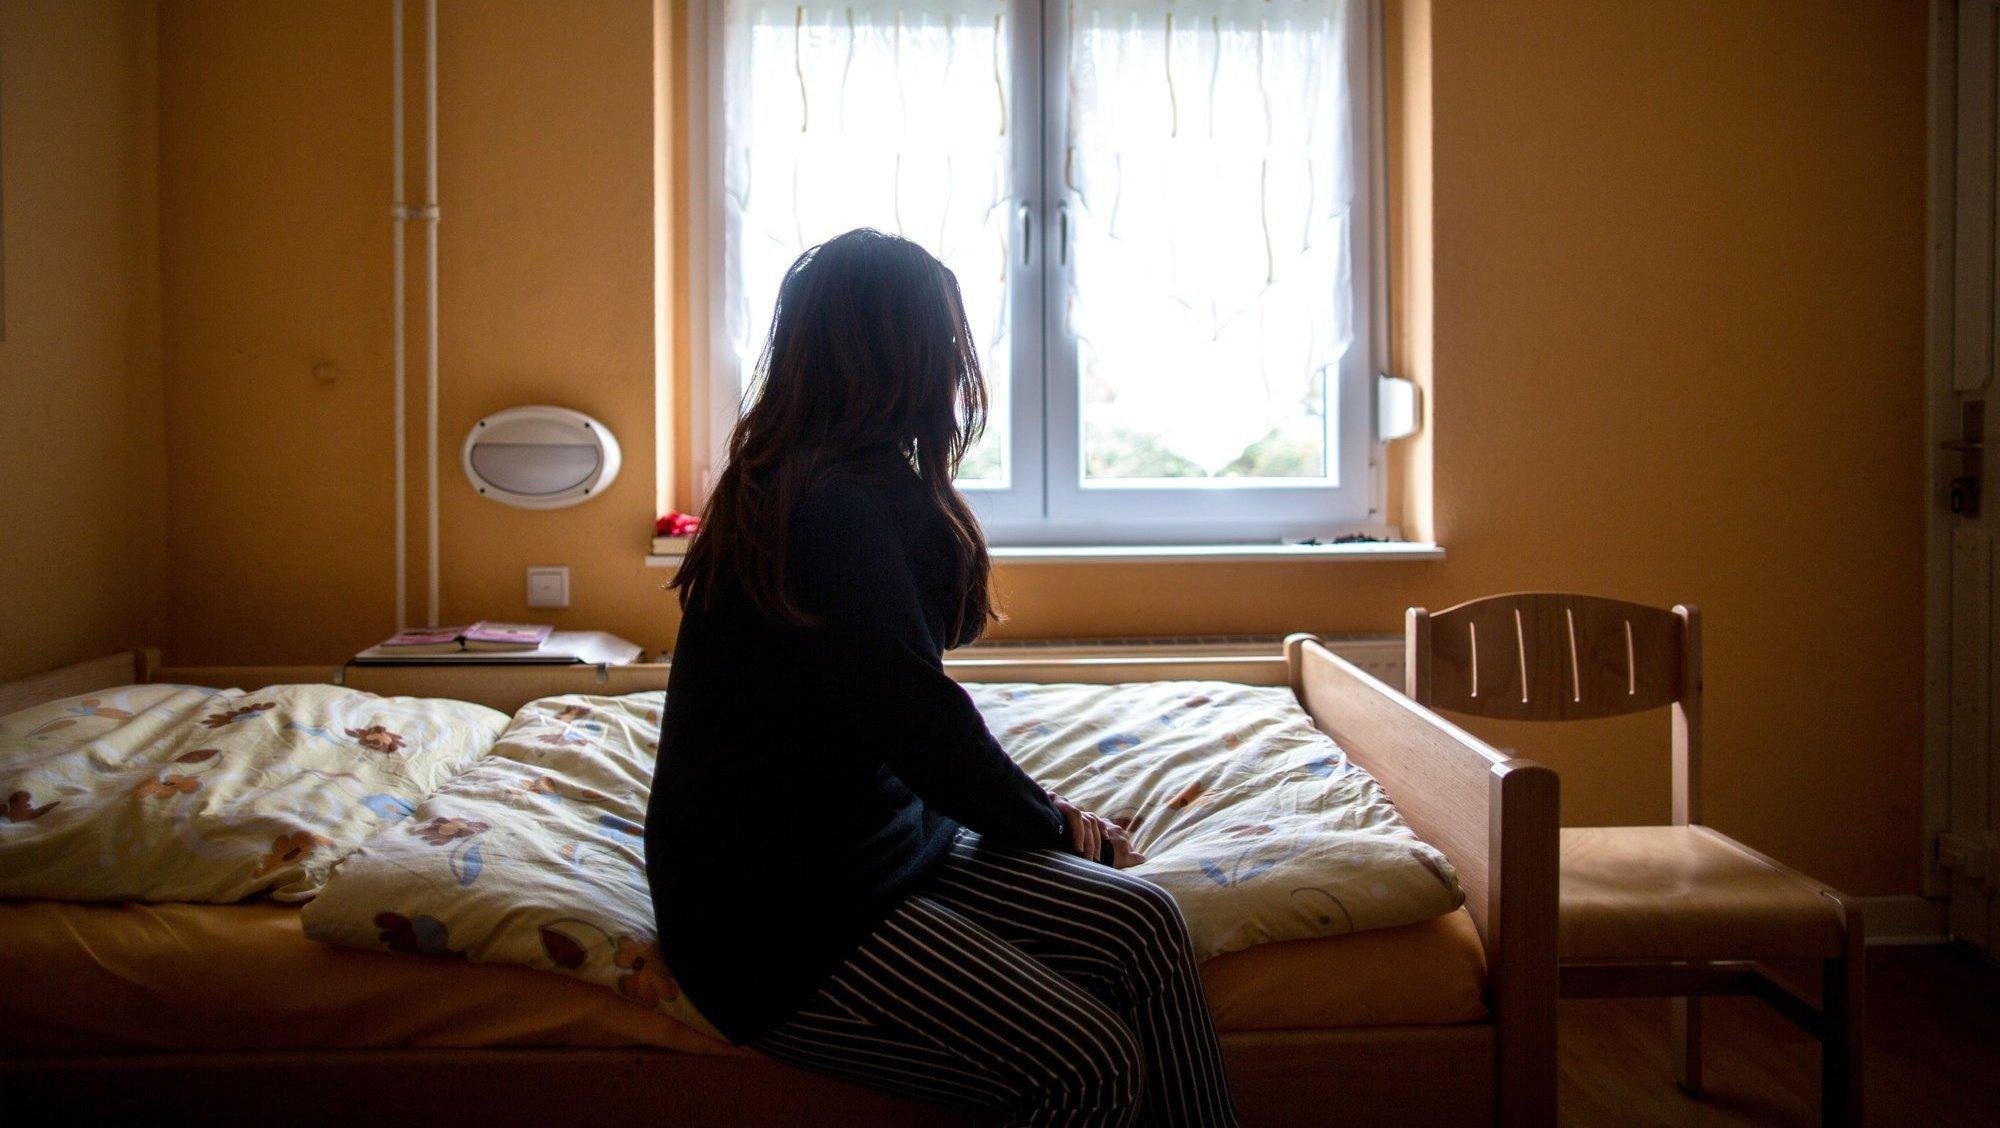 Femmes battues, Qatar, W.-C., antennes, que dit-on outre-Sarine?